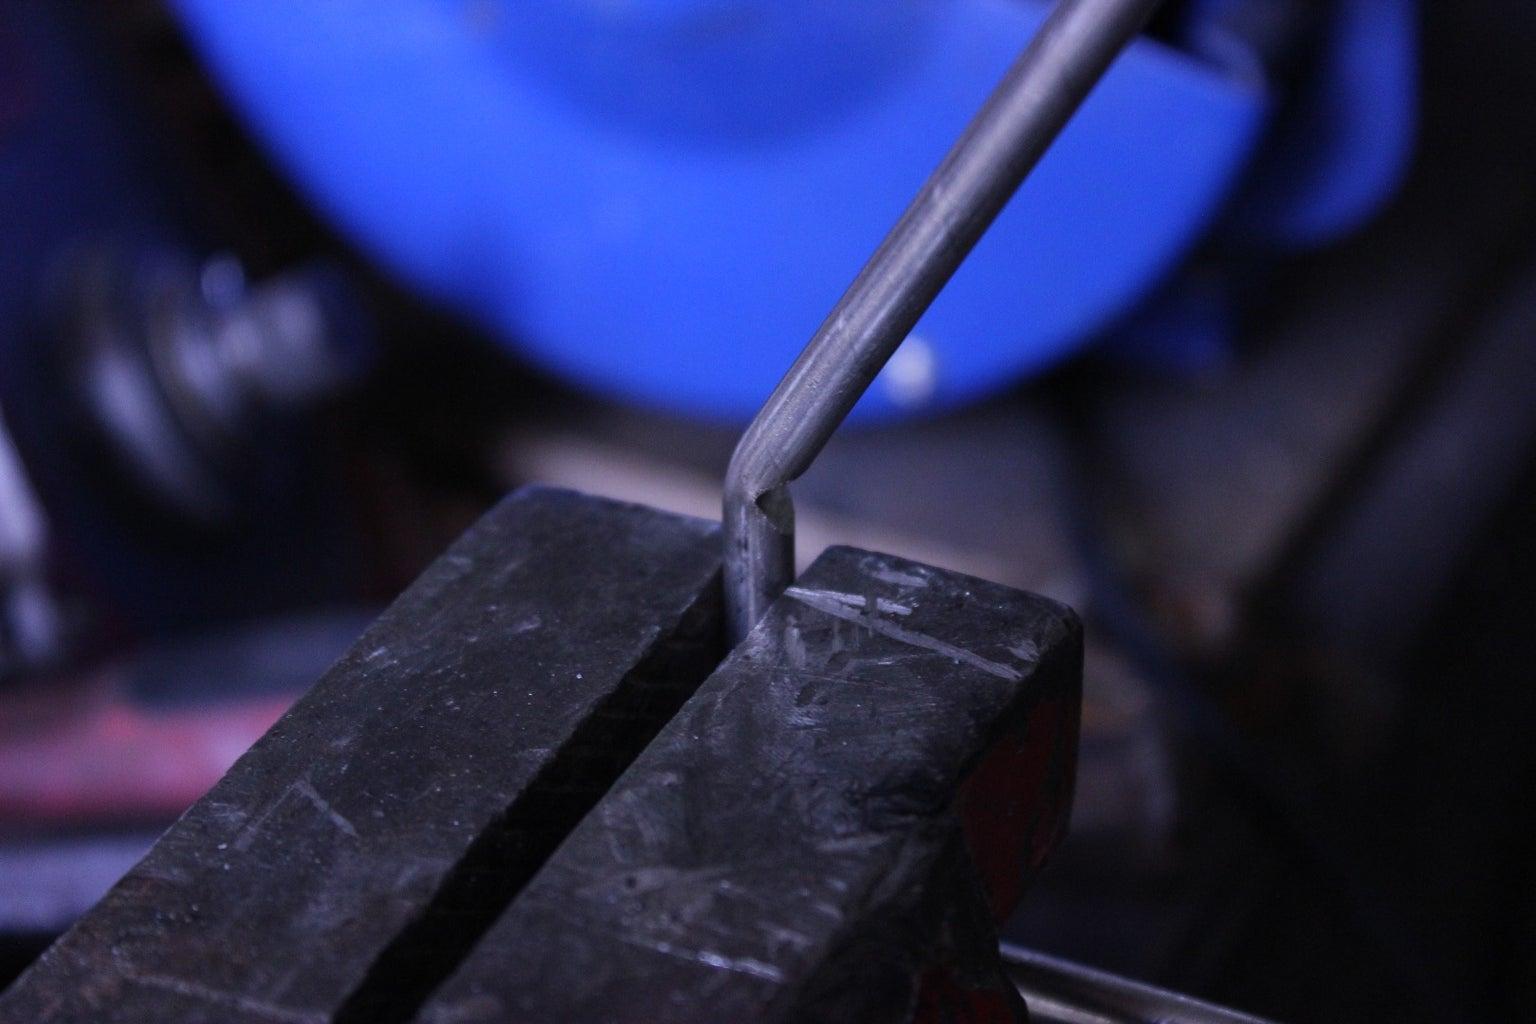 Bending the Rod